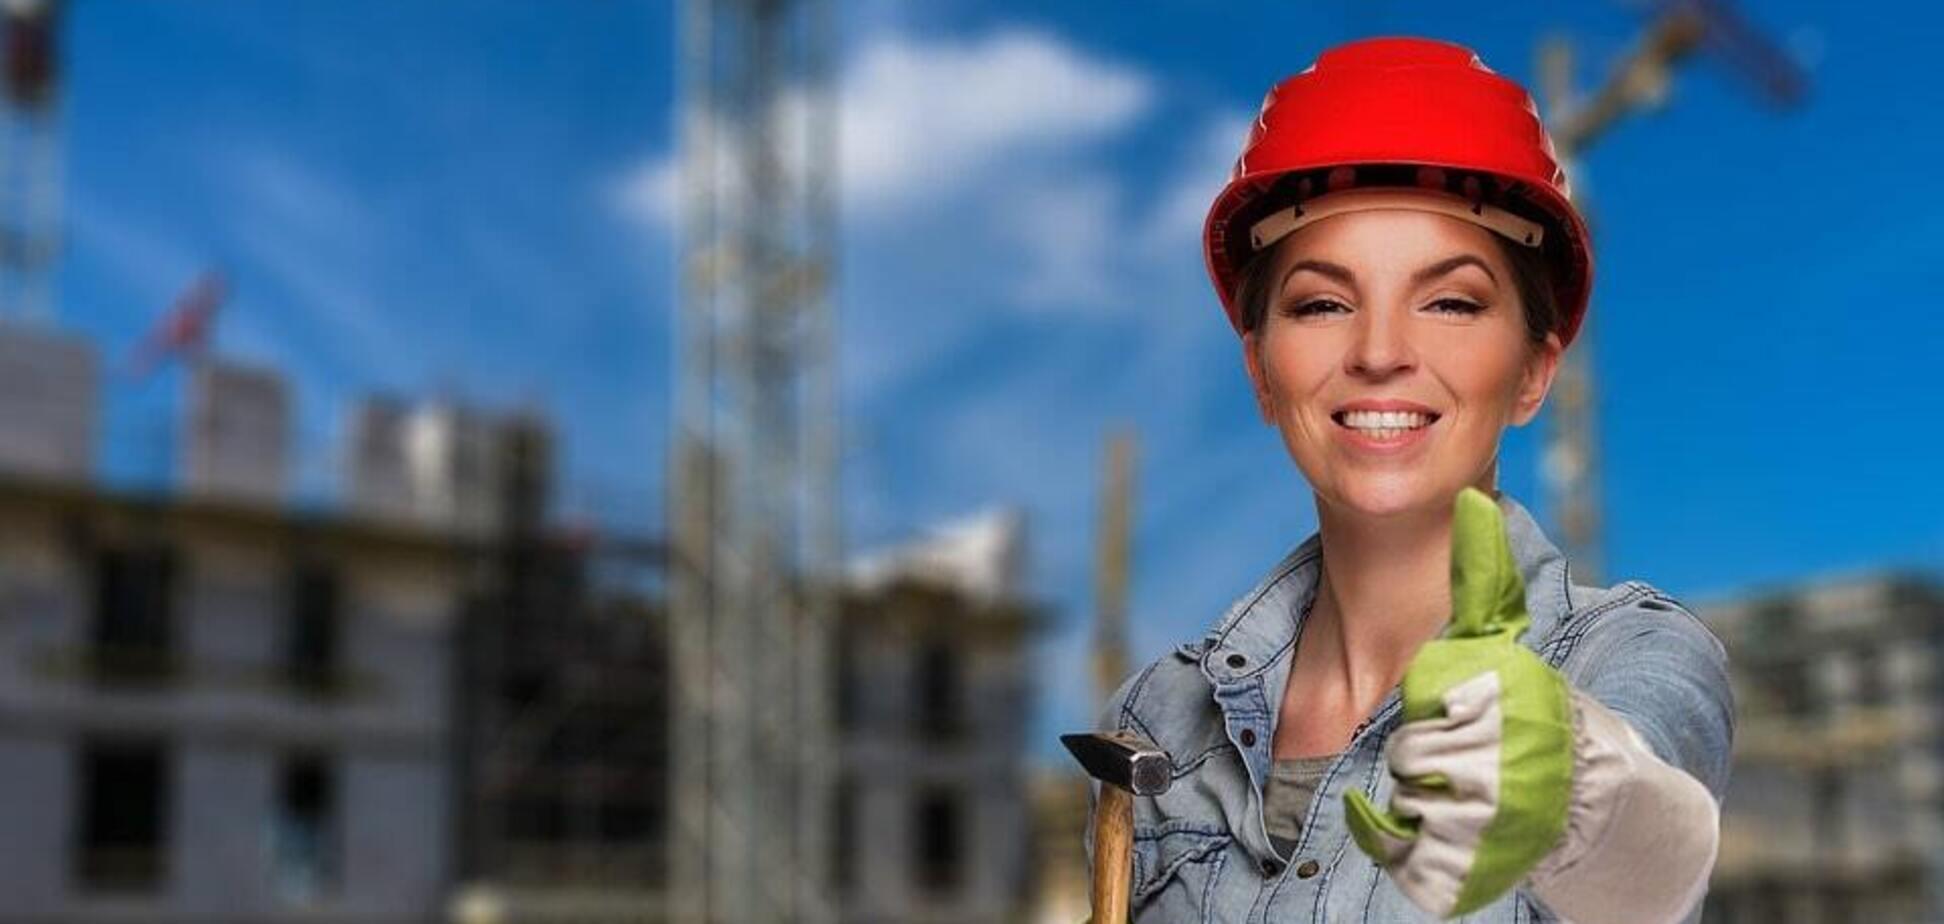 Україна впевнено нарощує обсяги будівництва житла – Держстат